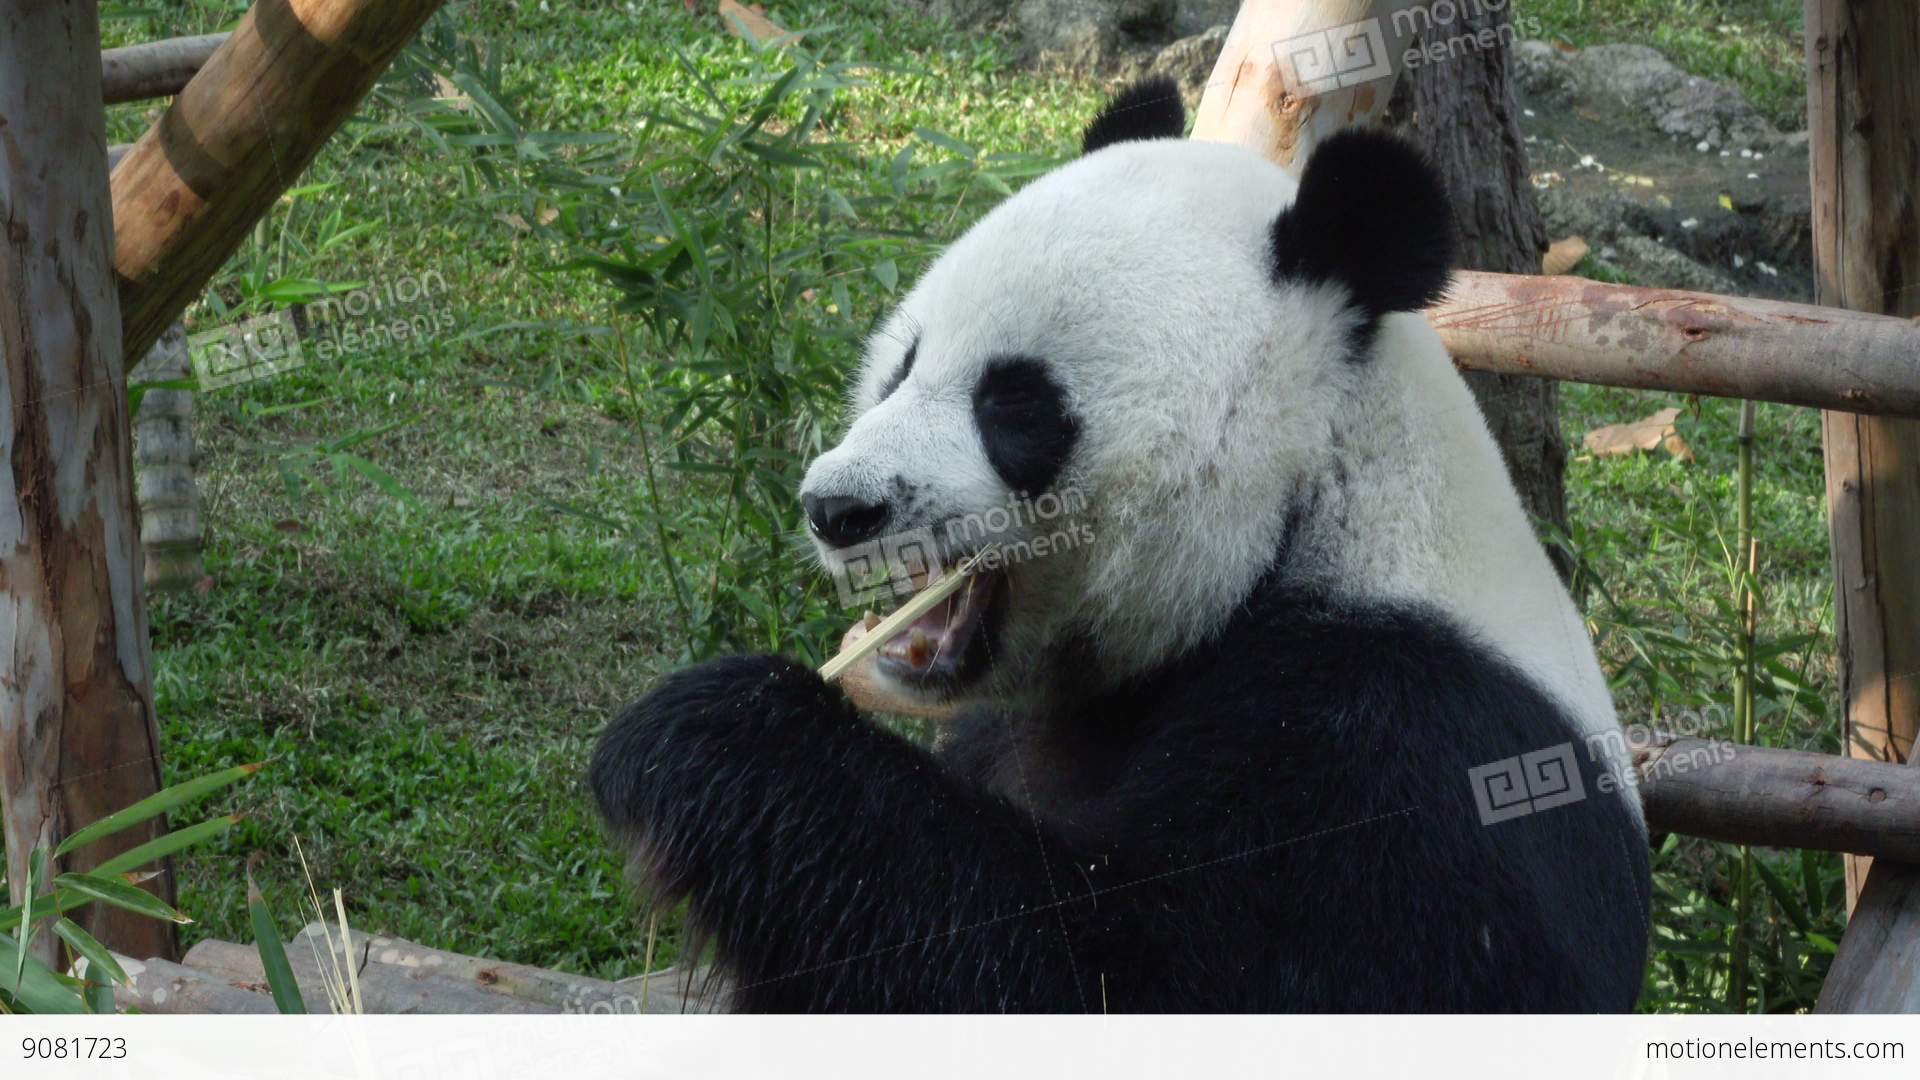 Medium shot of a funny giant panda eating bamboo 9081723 medium shot of a funny giant panda eating bamboo voltagebd Choice Image